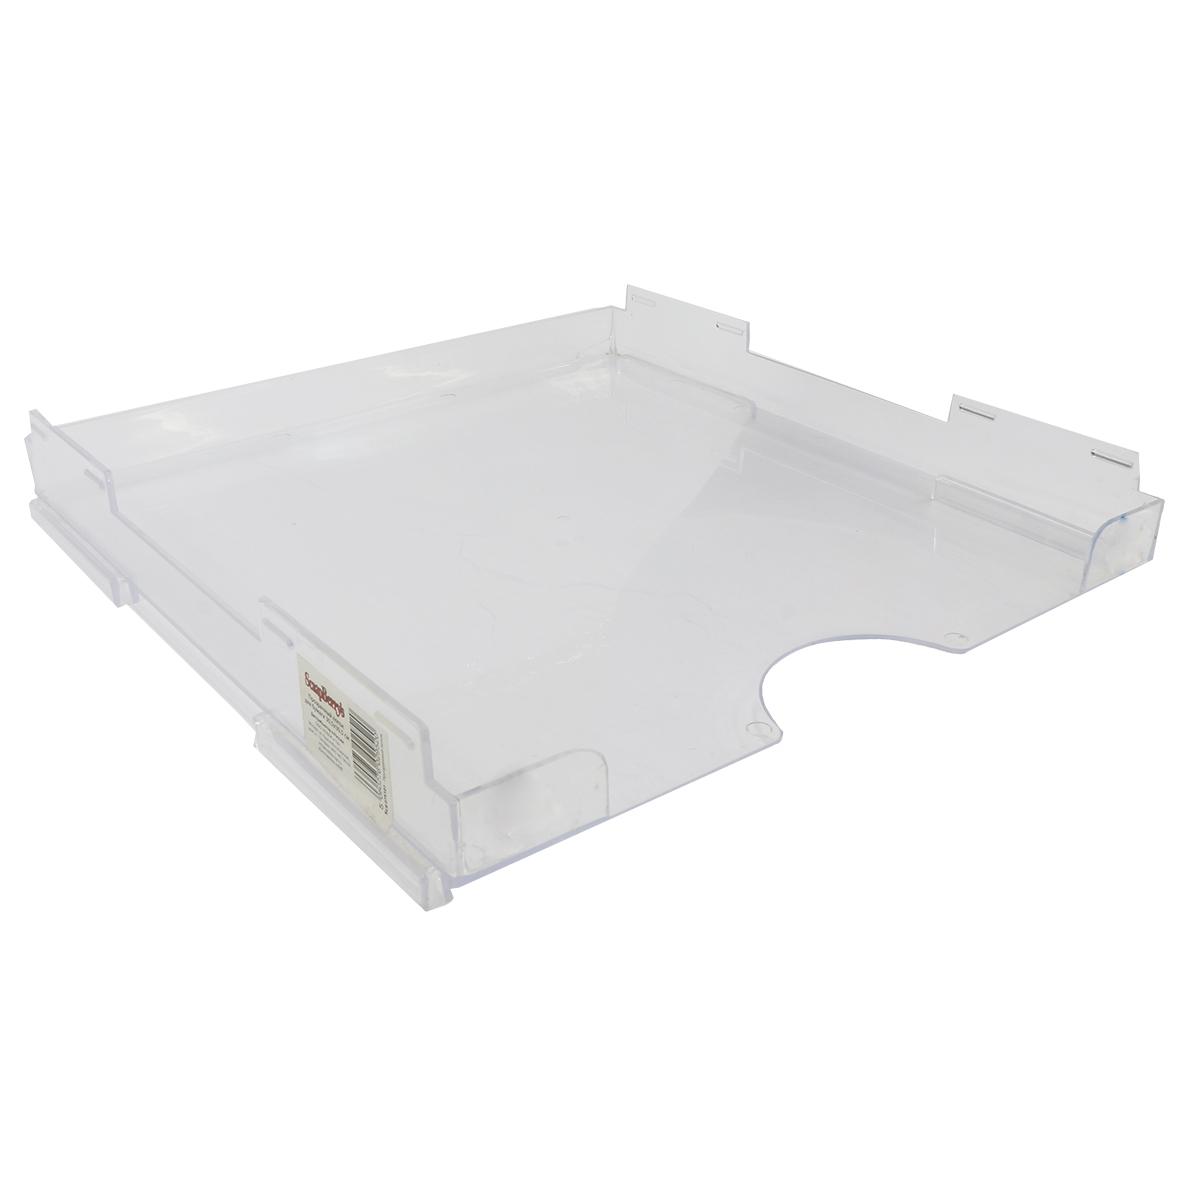 Scd 075101 Прозрачный лоток для бумаги б/у 30,5*30,5см